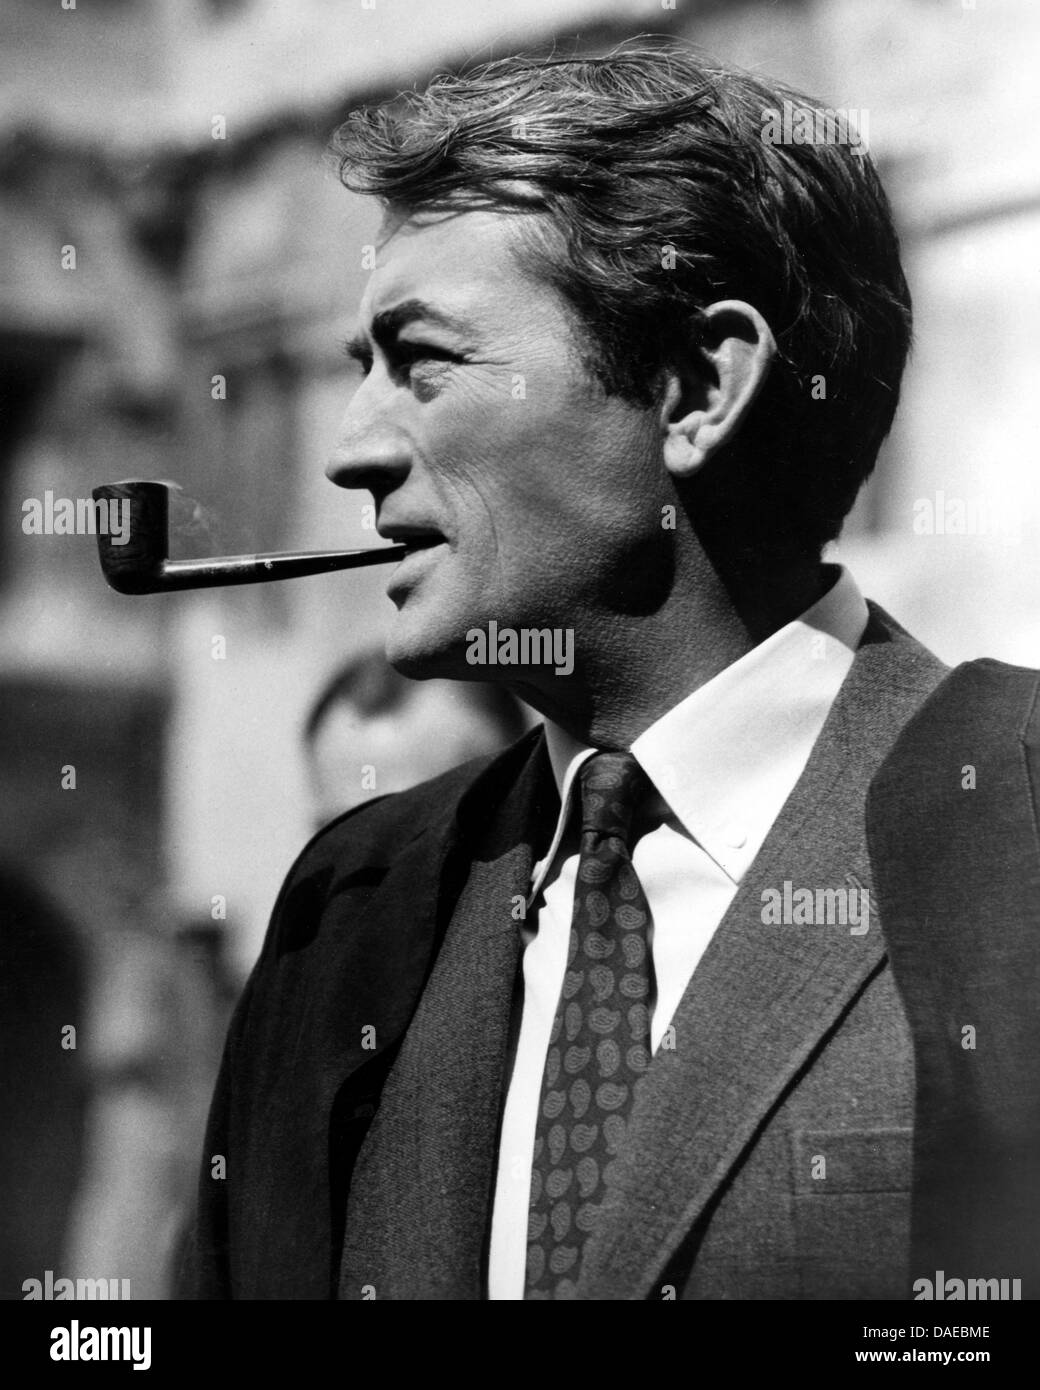 Gregory Peck on-set of the Film, 'Arabesque', Stanley Donen Enterprises with Distribution via Universal - Stock Image